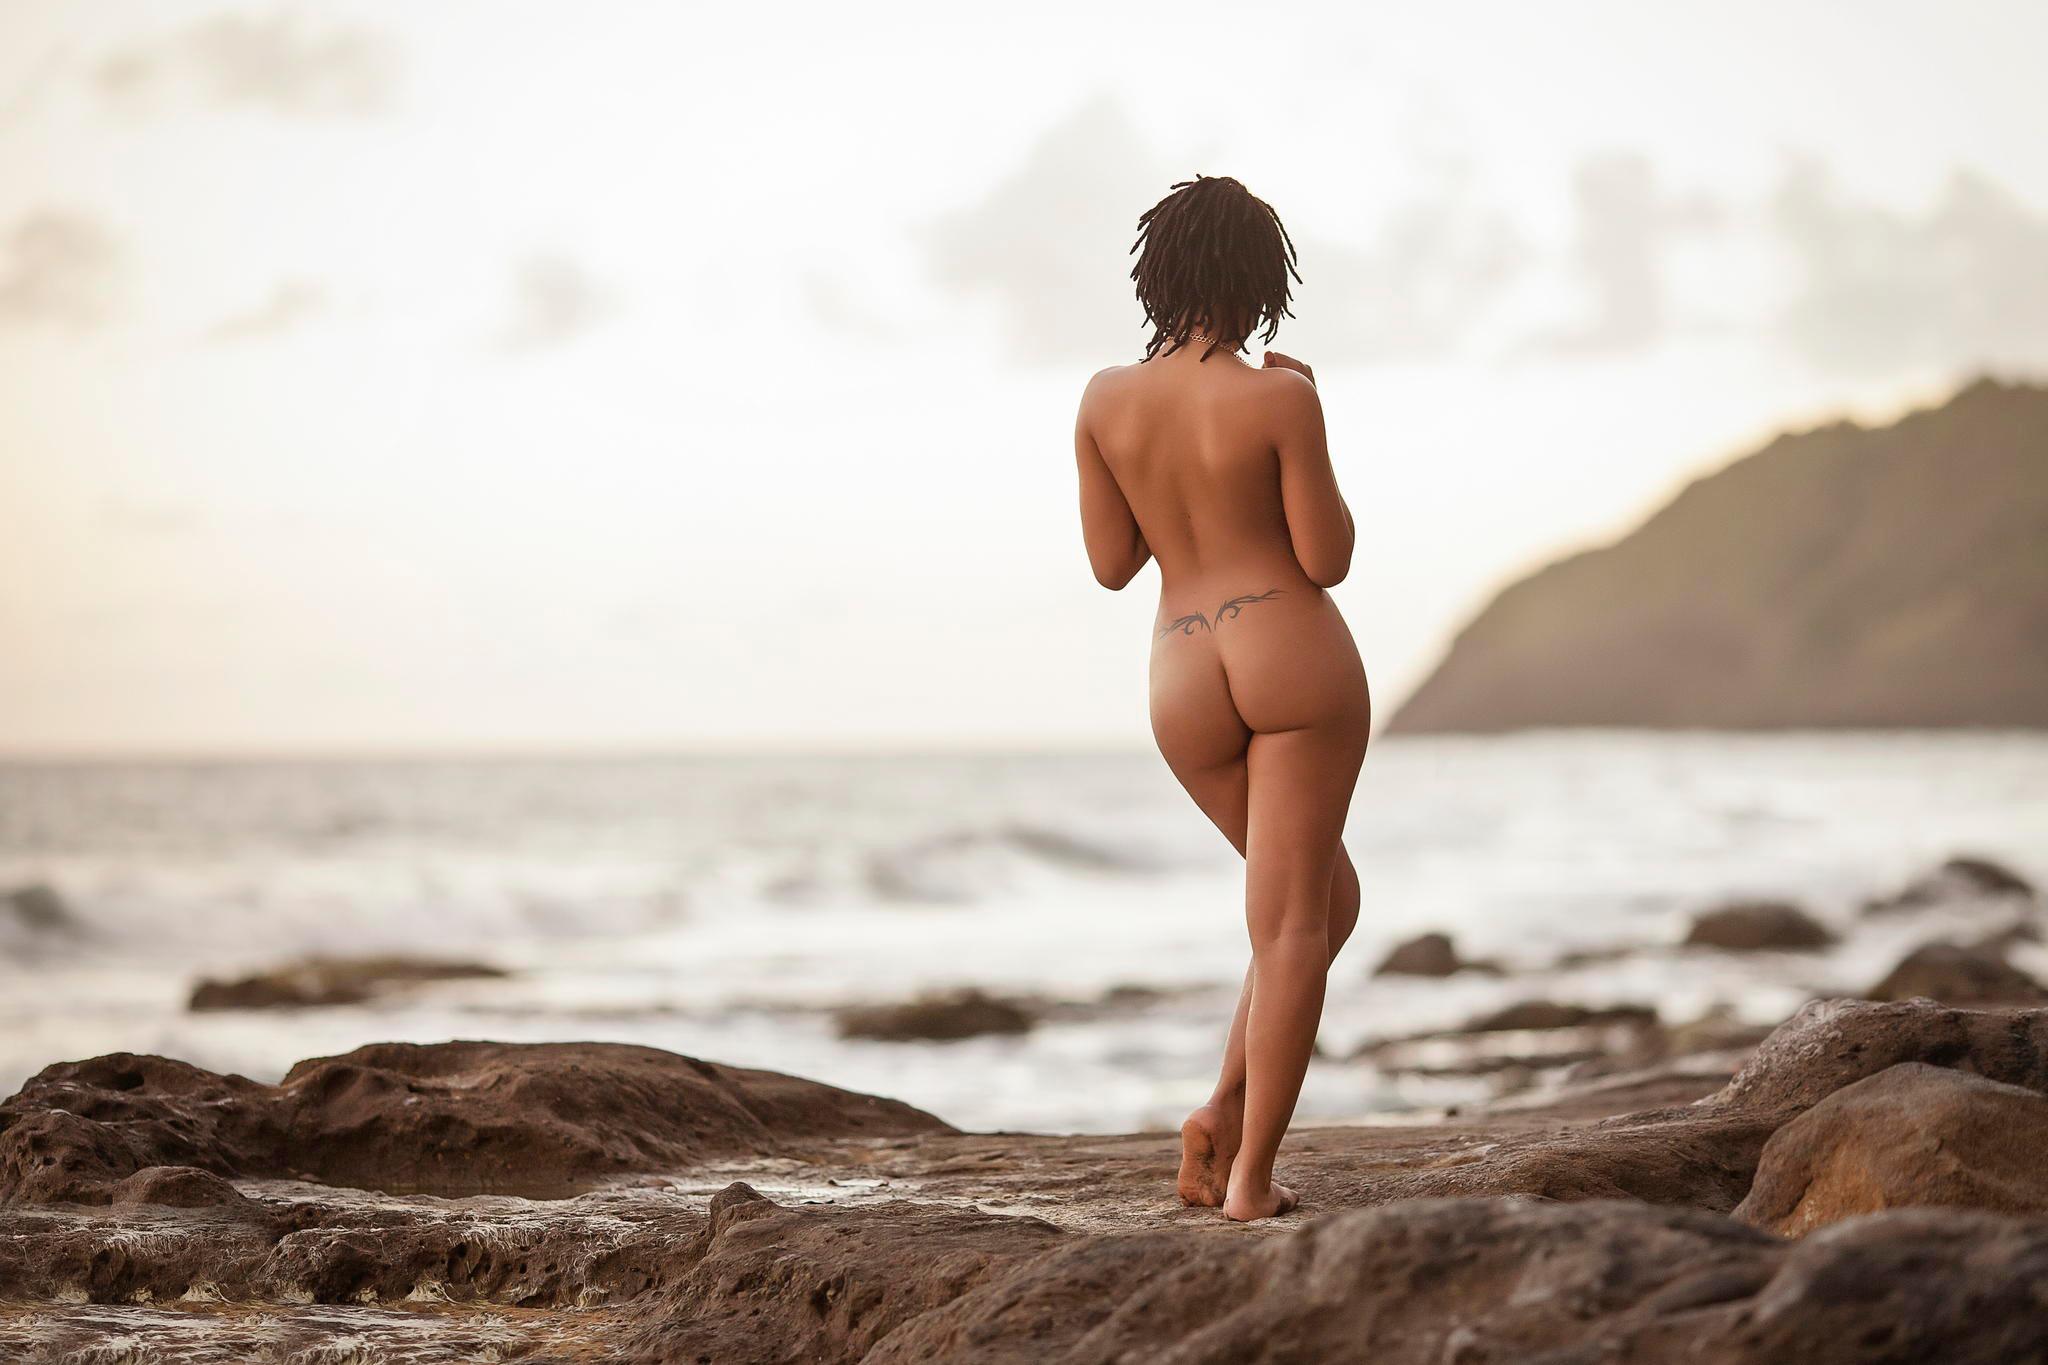 erotichnie-foto-krasivih-devushek-na-beregu-morya-tolpa-chernih-trahaet-belokuruyu-devku